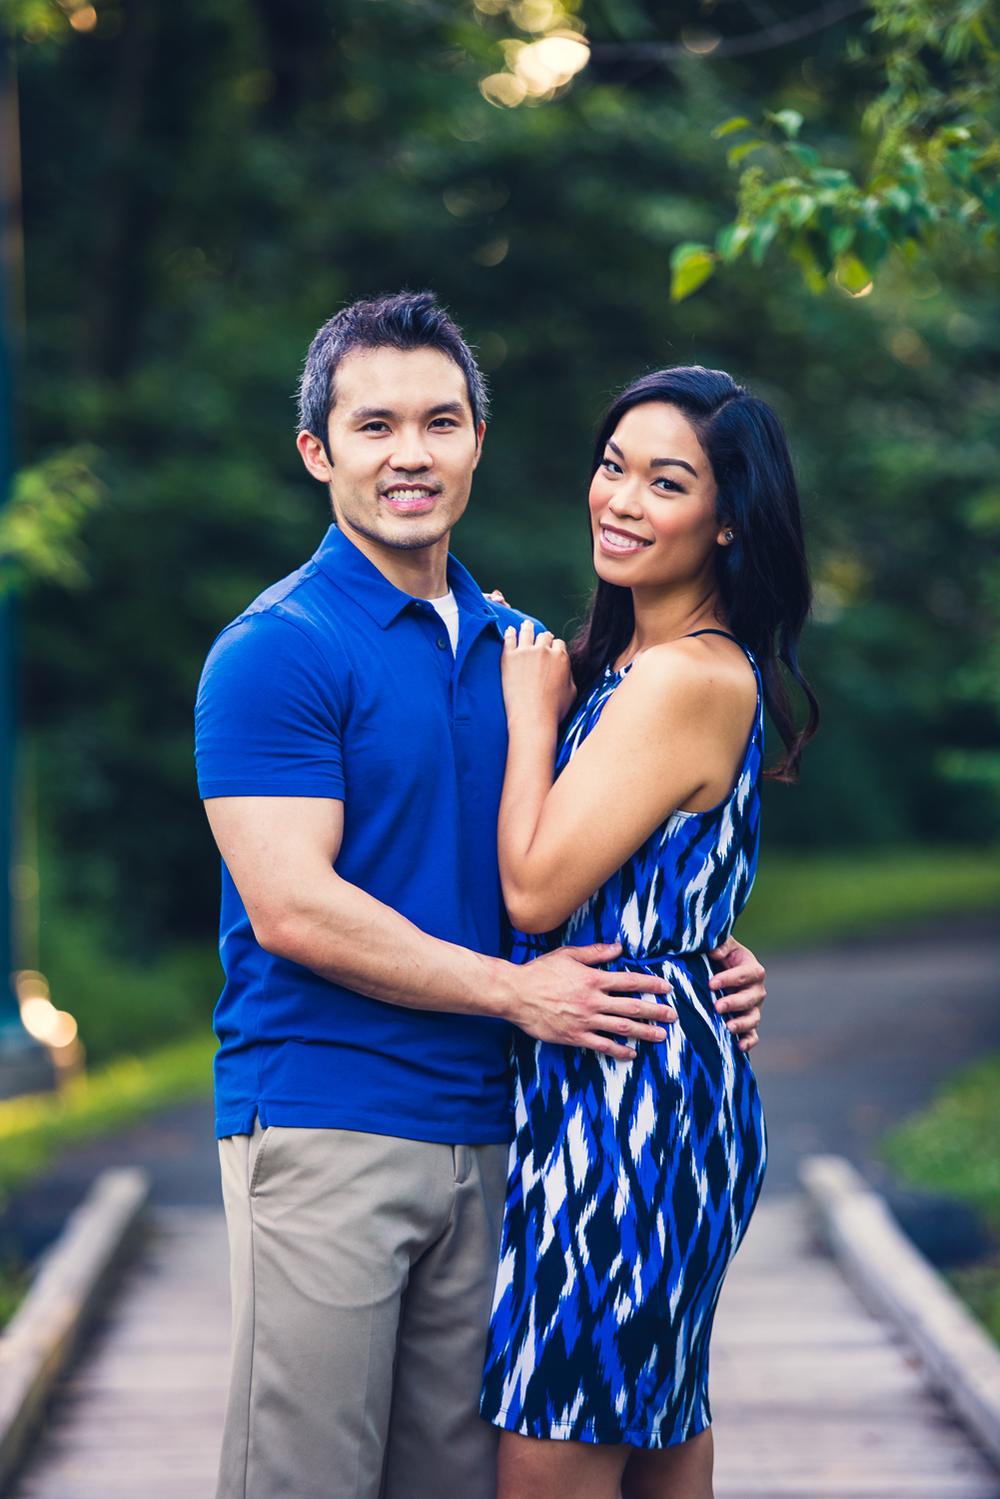 20160705 - Justine Wu Engagement Pix LR-6.jpg